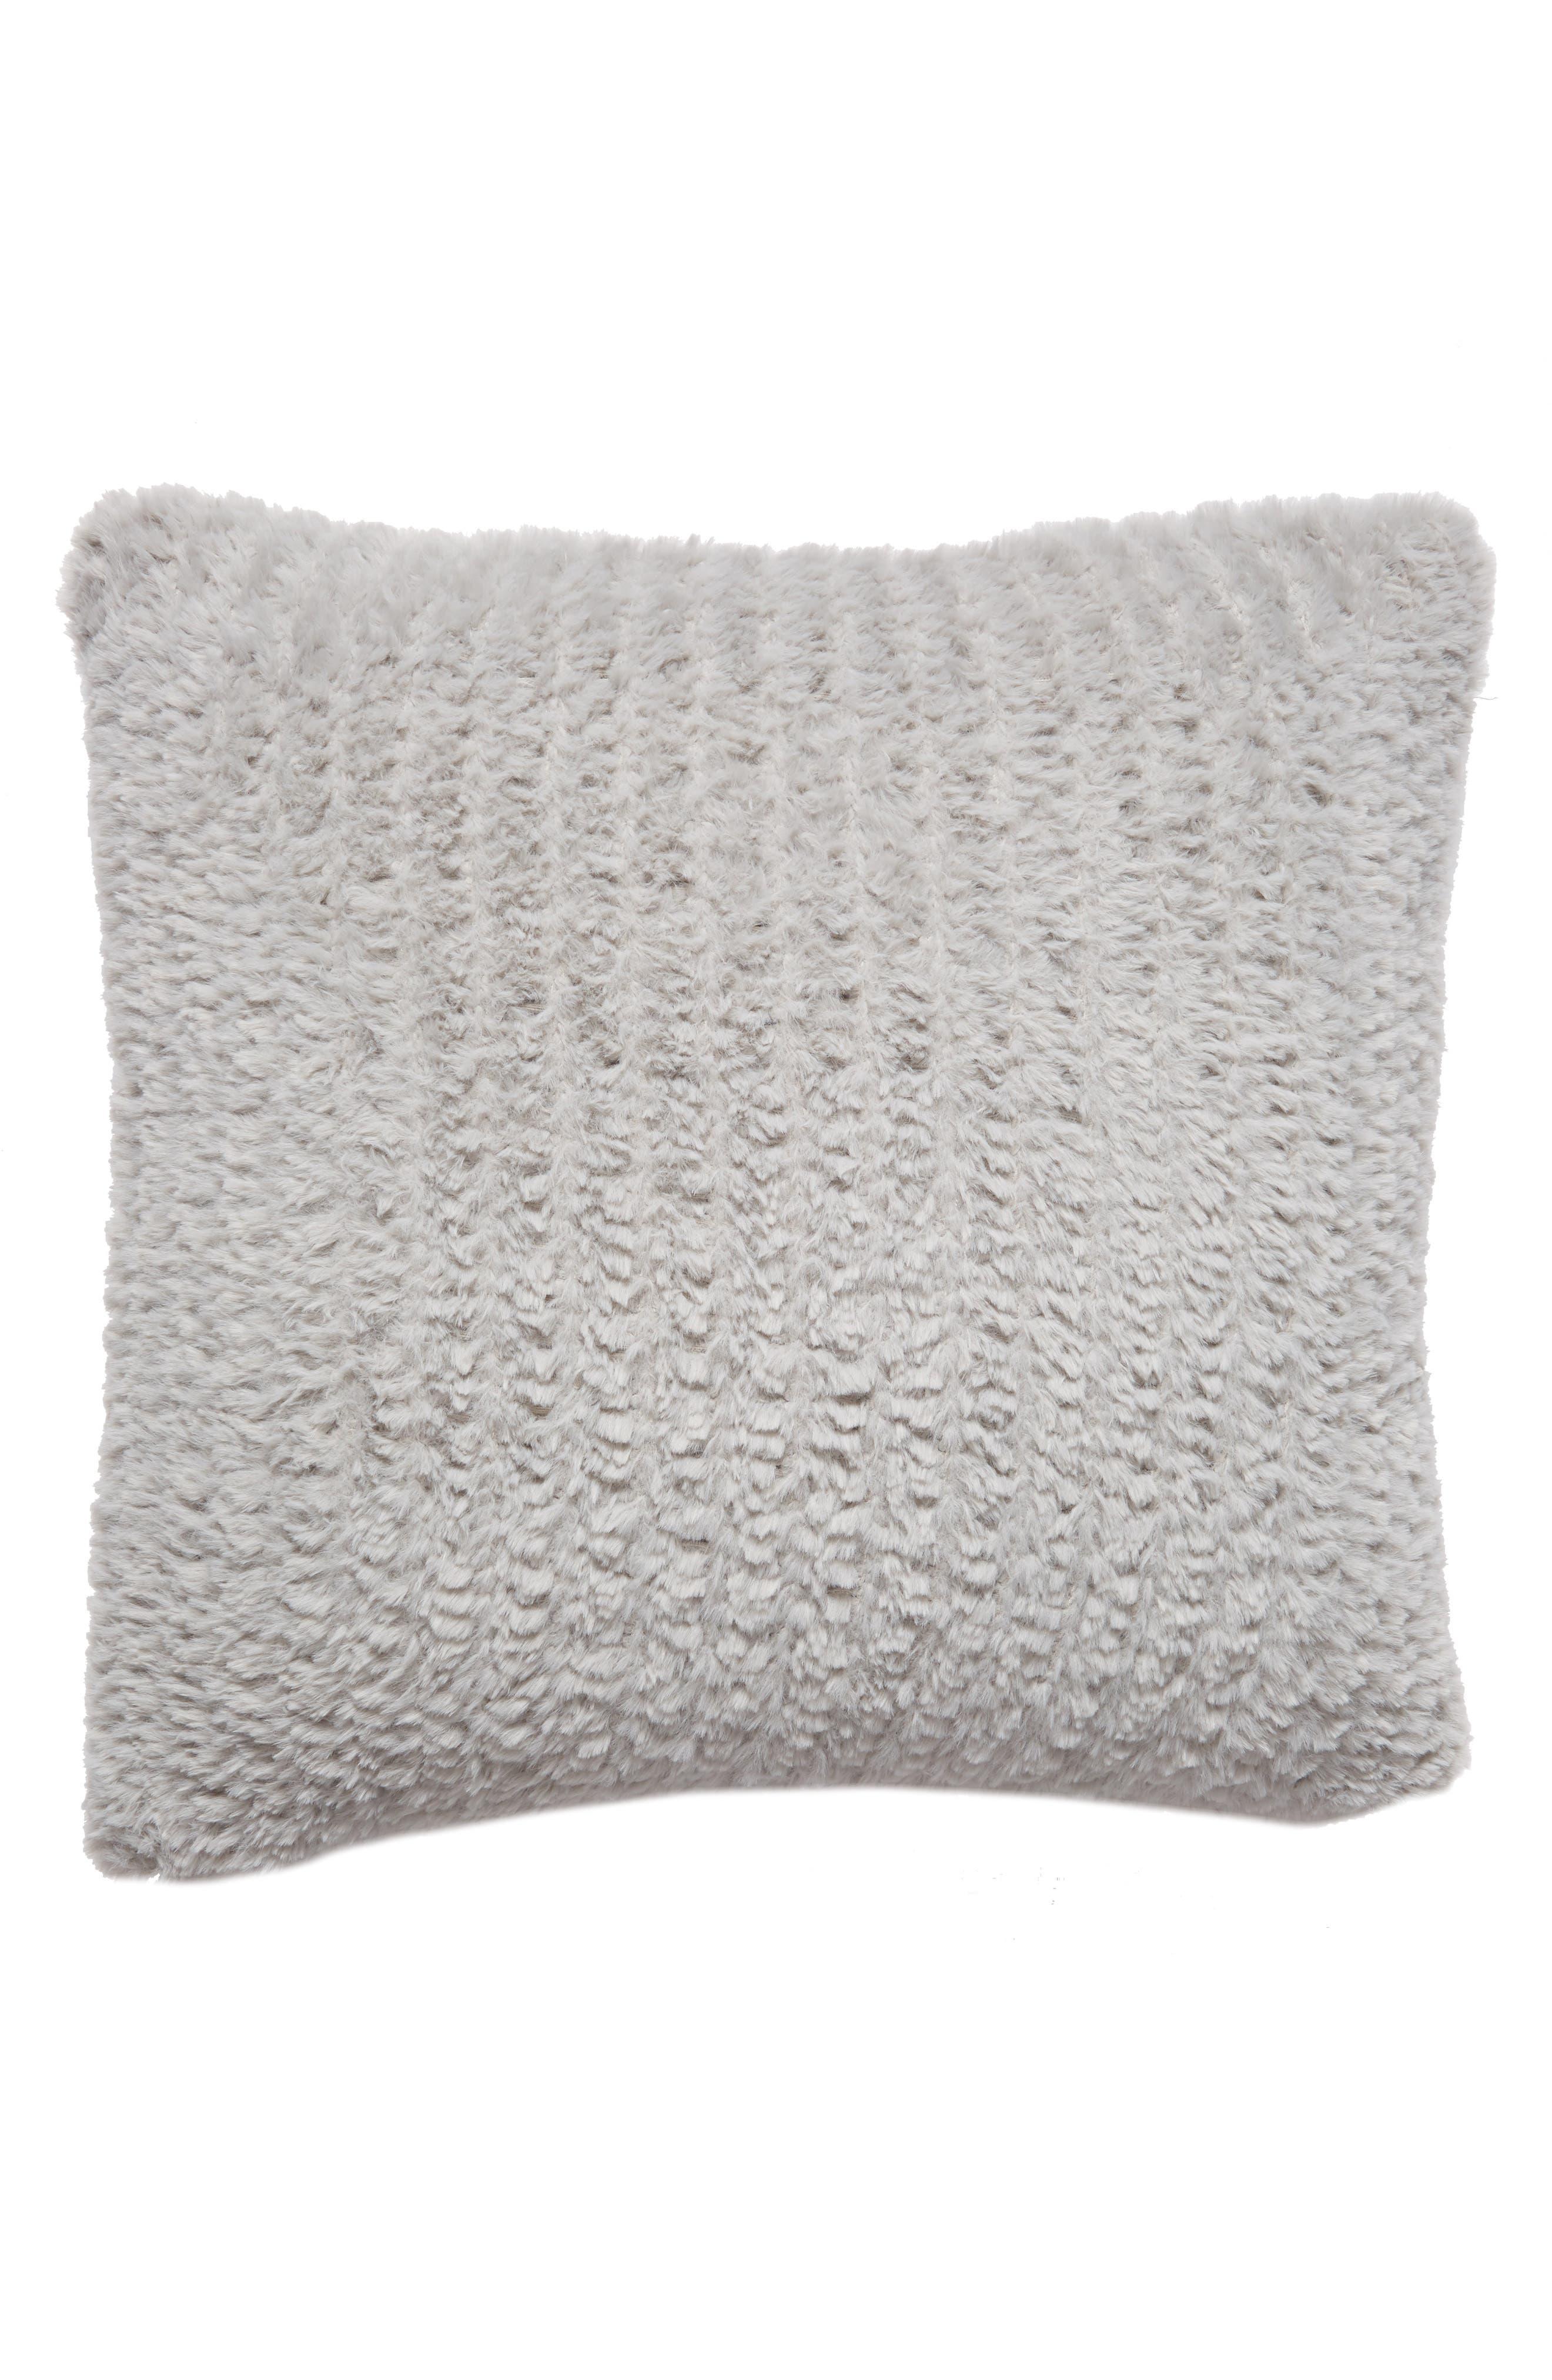 NORDSTROM AT HOME, Lazy Days Faux Fur Accent Pillow, Alternate thumbnail 2, color, GREY VAPOR